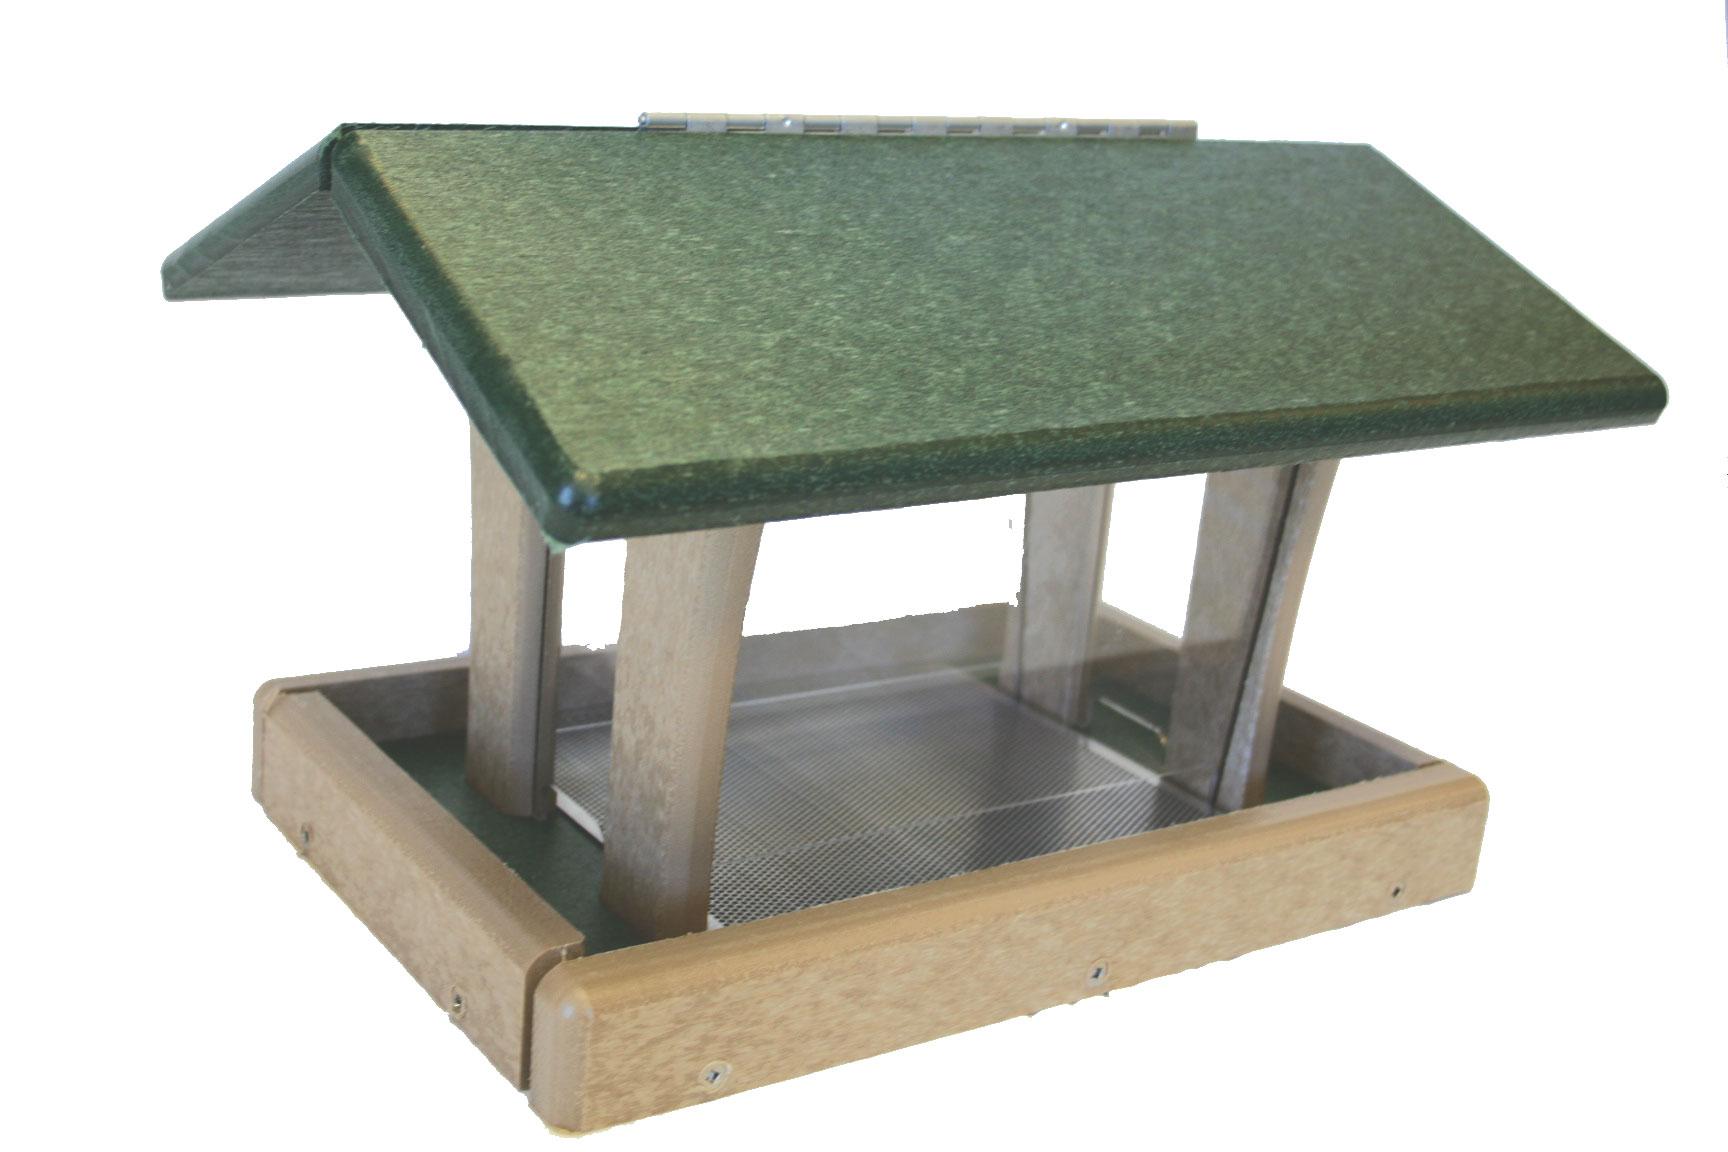 3 qt Recycled 4-sided Hopper Feeder